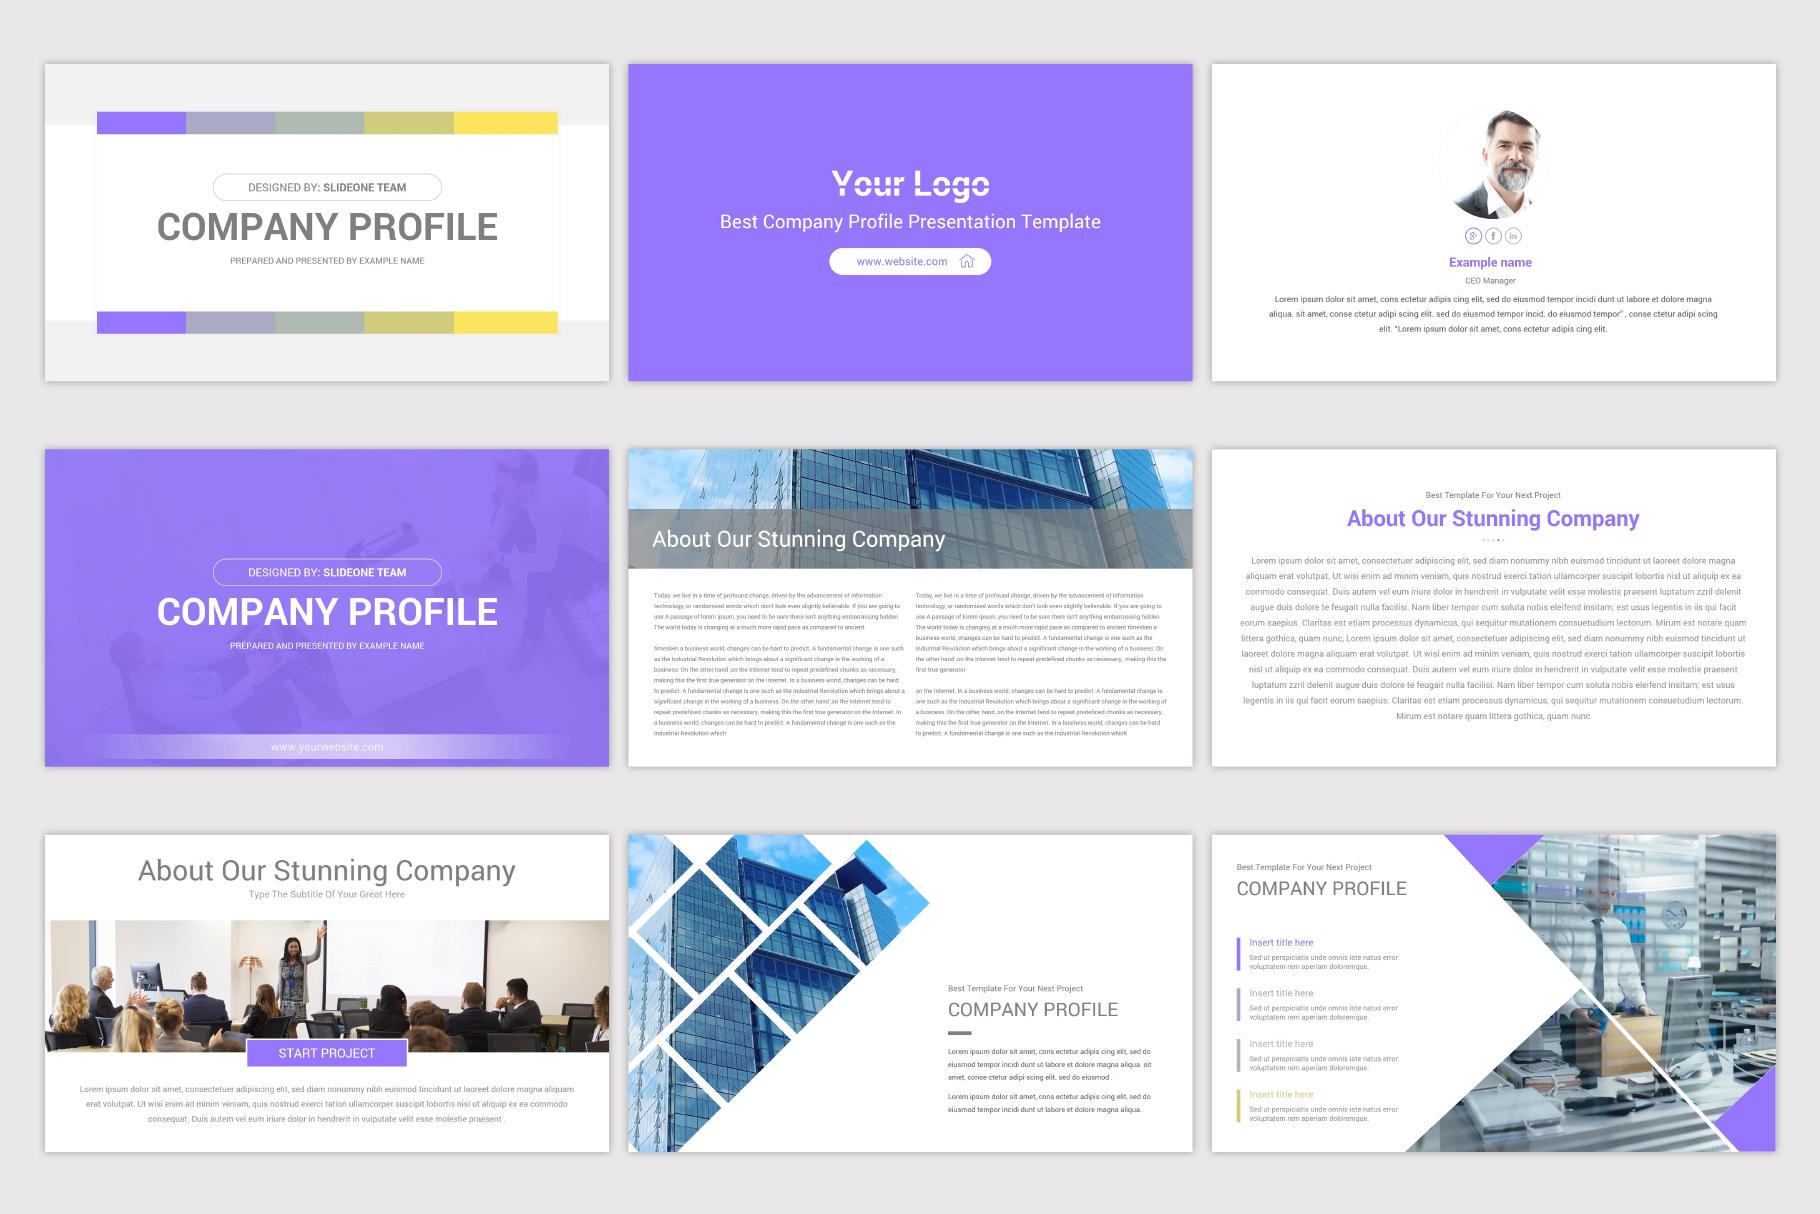 Company Profile Keynote Template example image 4